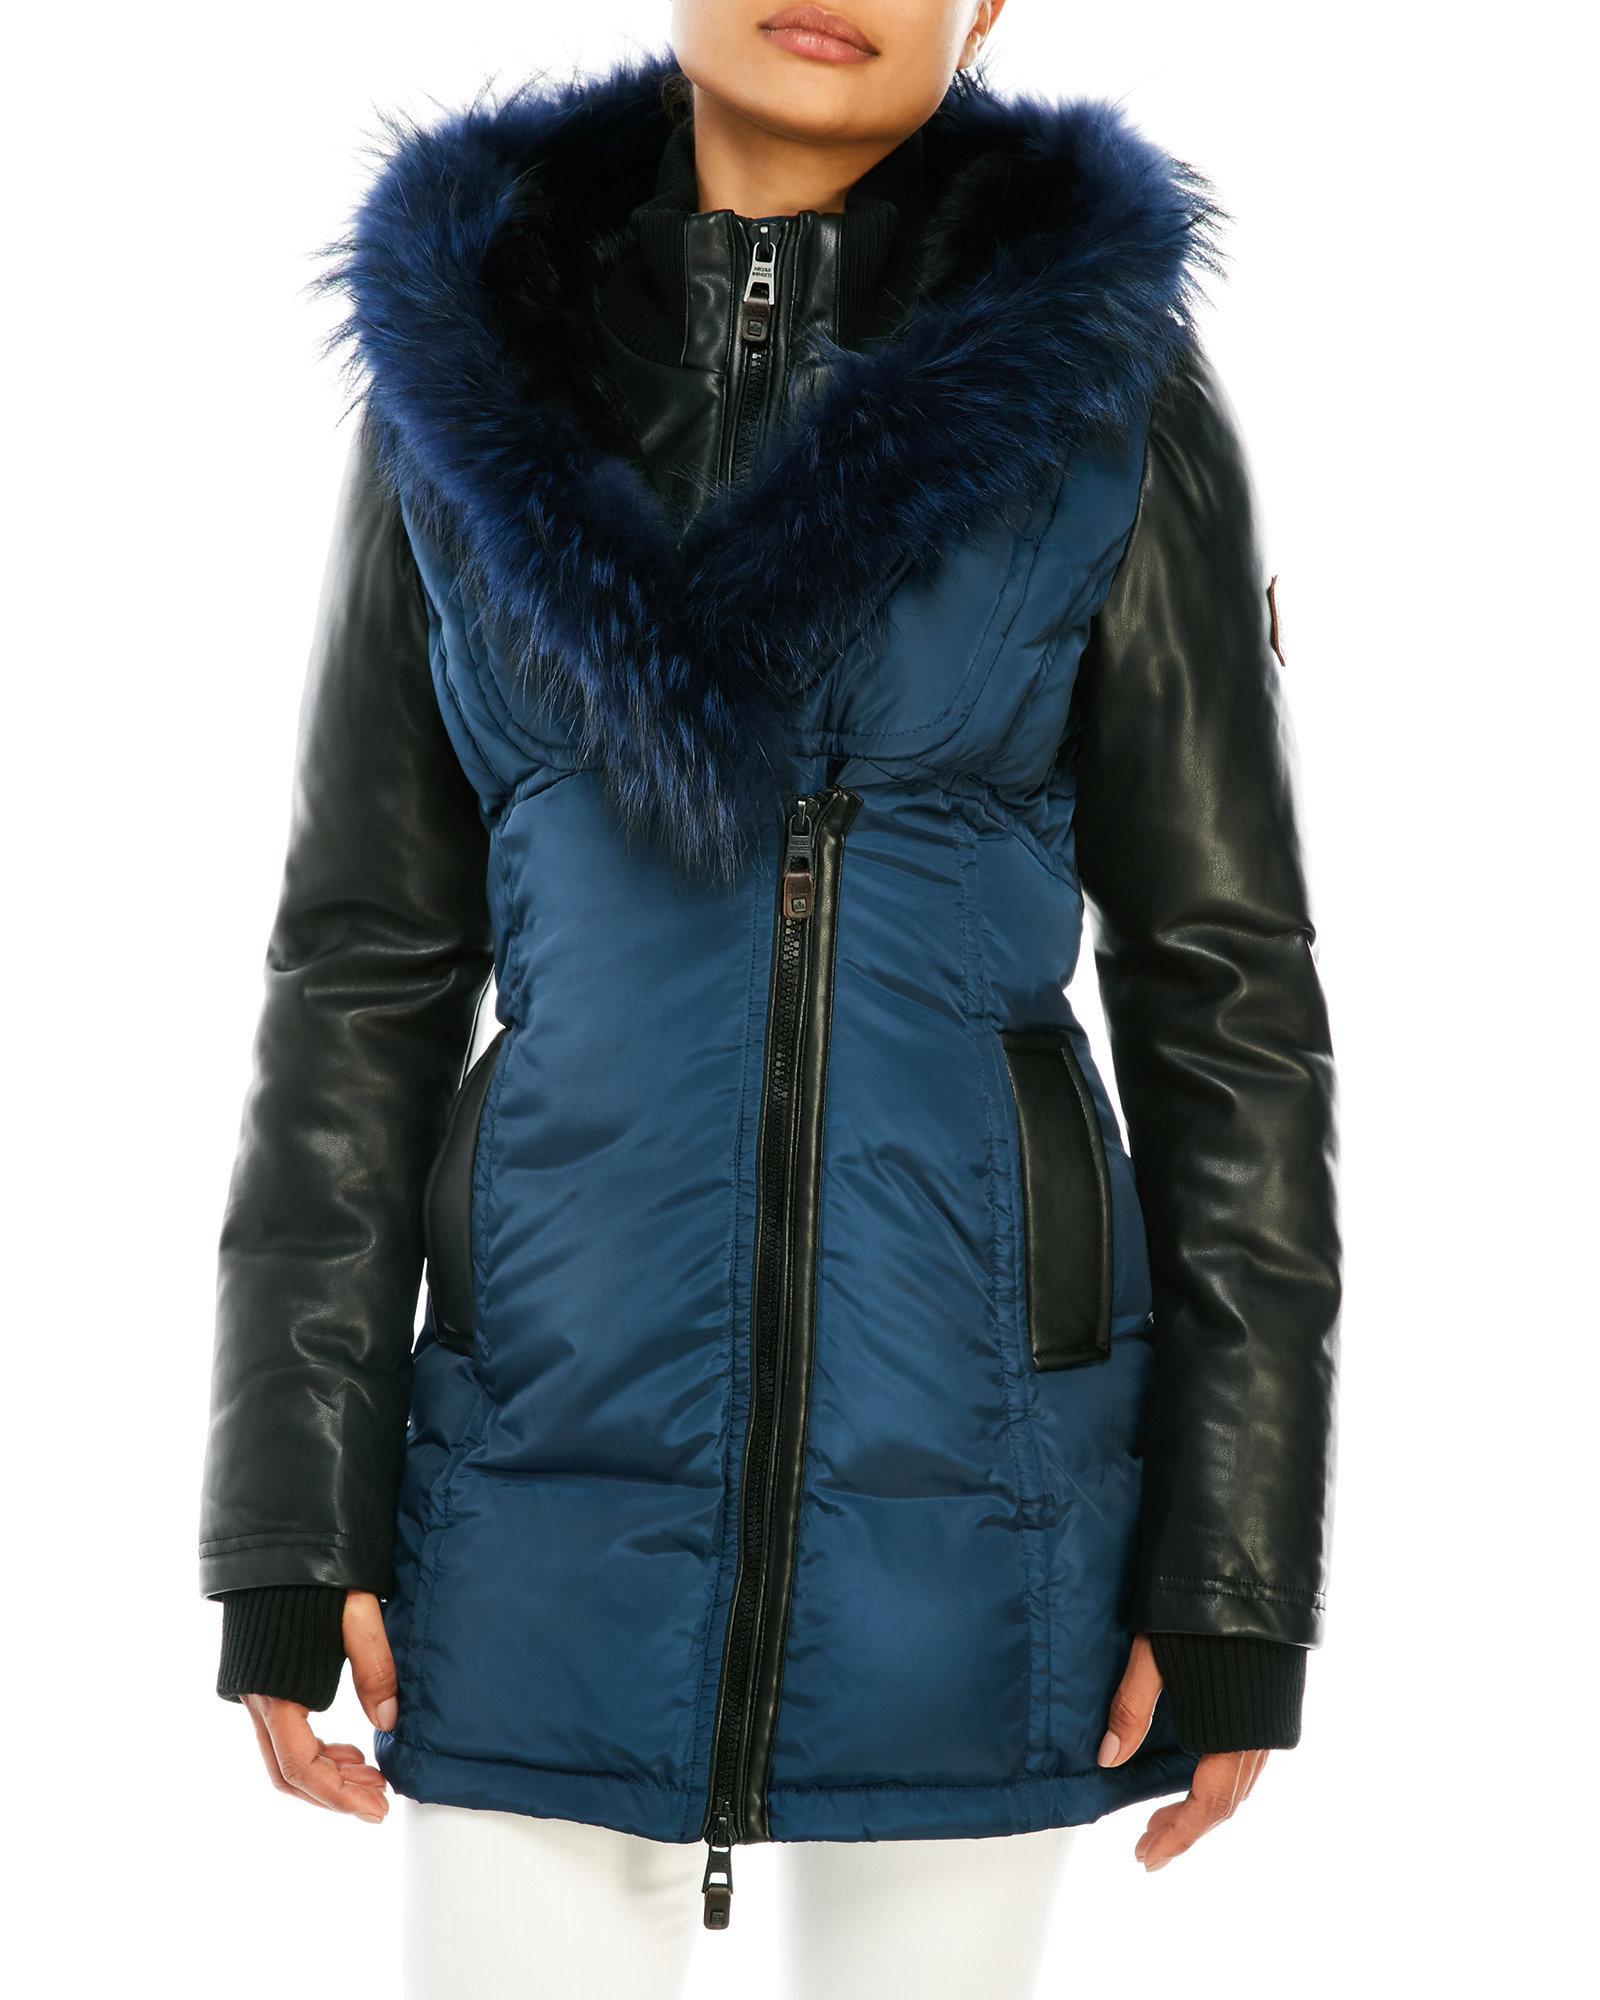 Nicole benisti Asymmetrical Zip Coat With Real Fur Trim Hood in ...